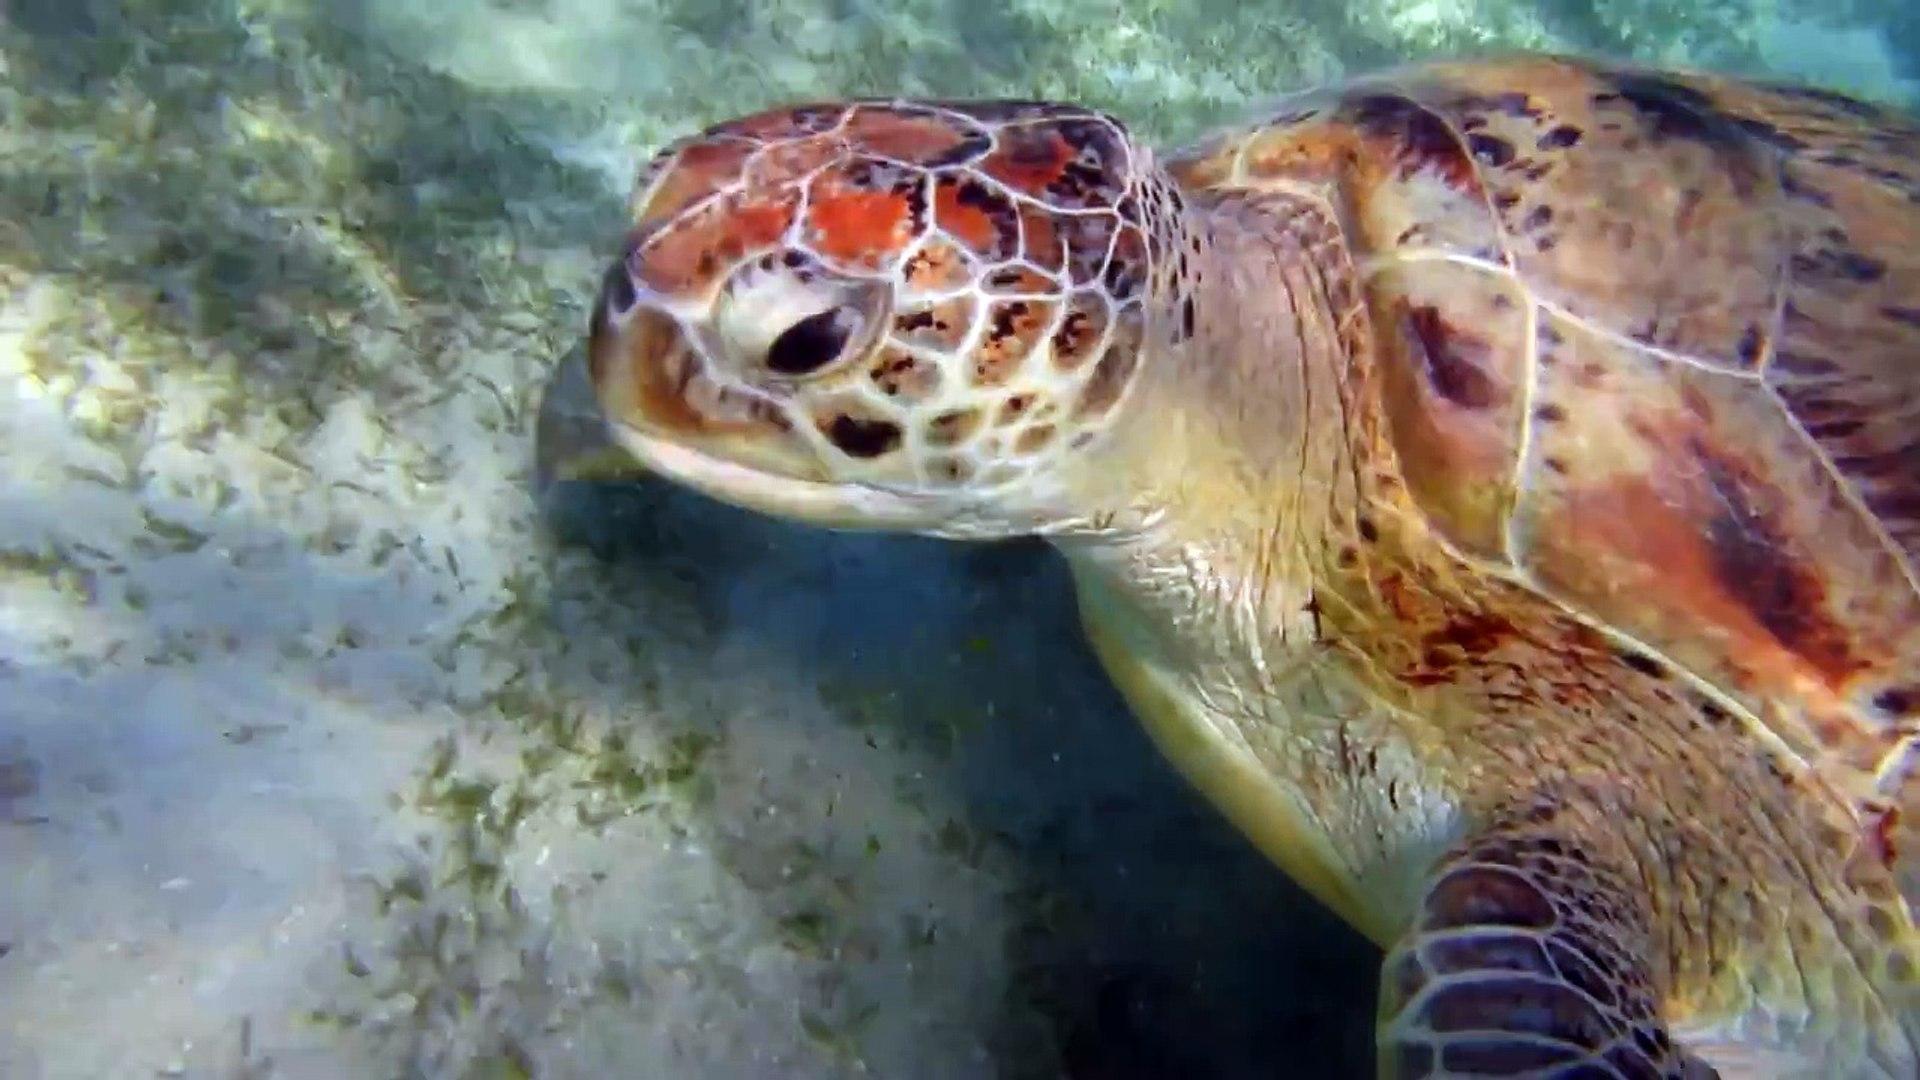 Черепахи и скаты Марса Мубарак, Марса Алам, Египет. Turtles and rays of Marsa Mubarak